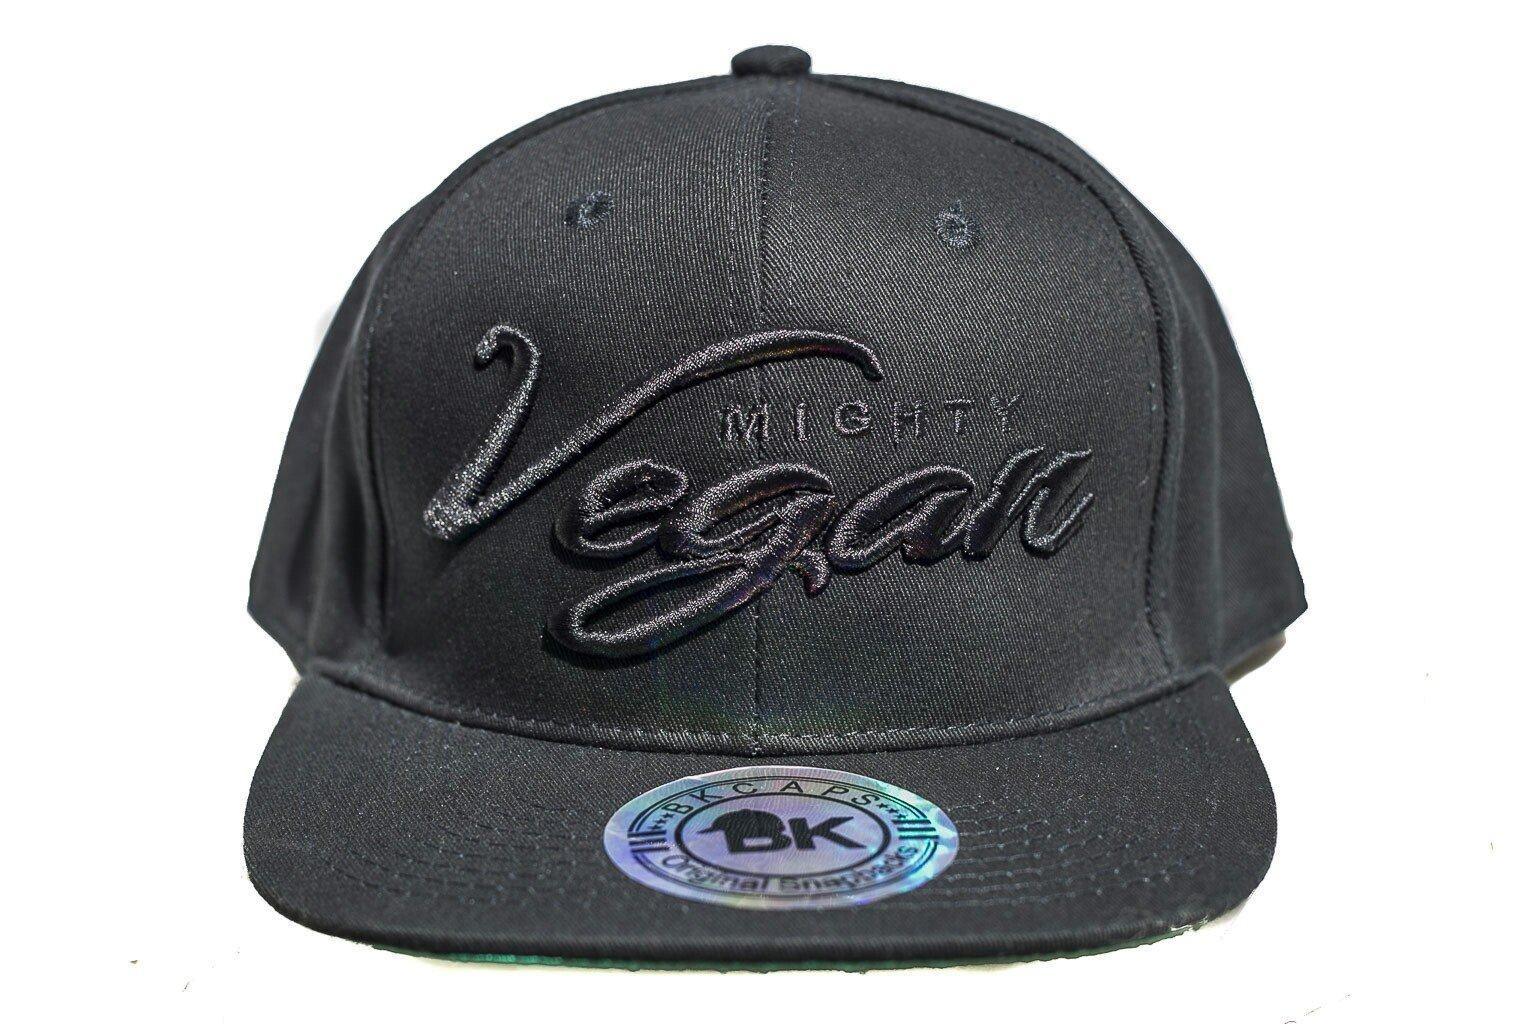 d2c2902cd11 Mighty Vegan Apparel — MVA BLACK CURSIVE 3D EMBROIDERY on BLACK SNAPBACK HAT